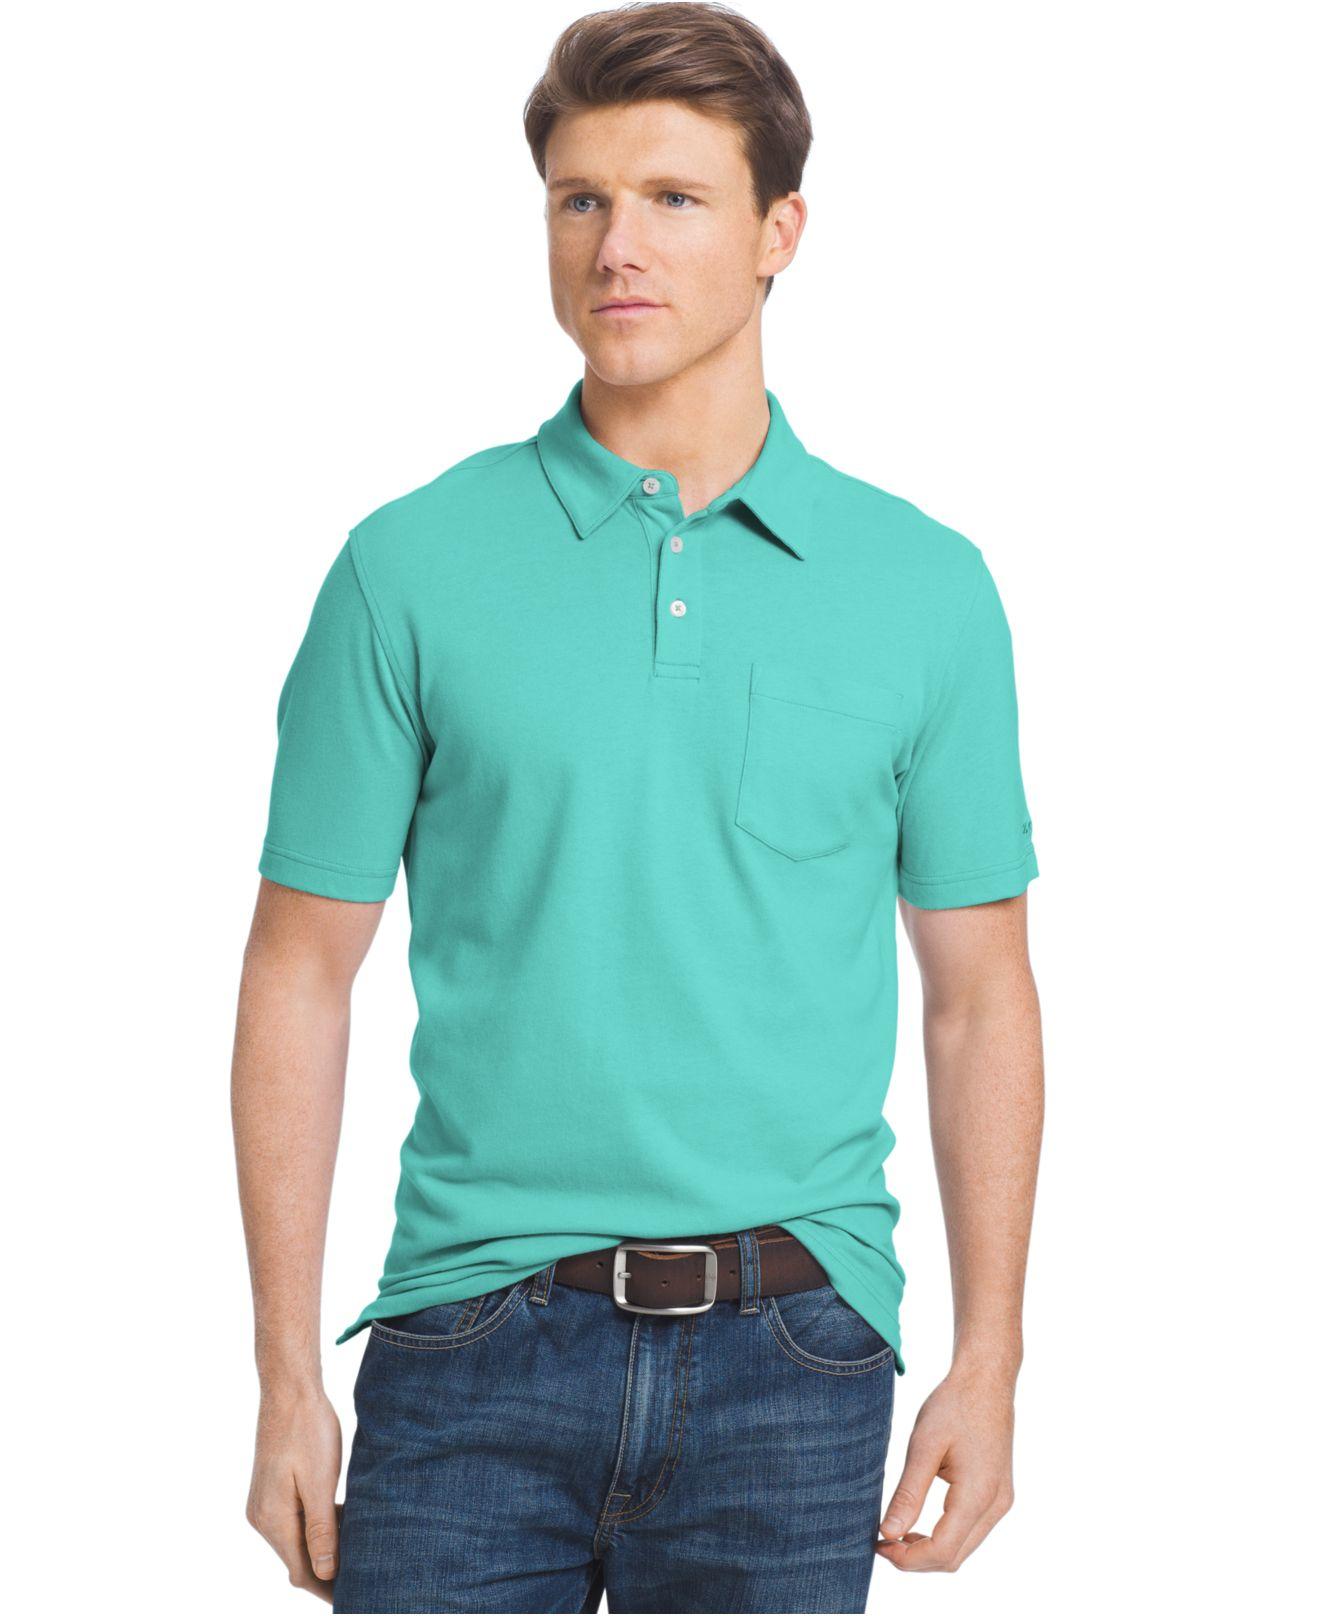 Izod men 39 s fairway polo shirt in blue for men lyst for Aqua blue mens dress shirt